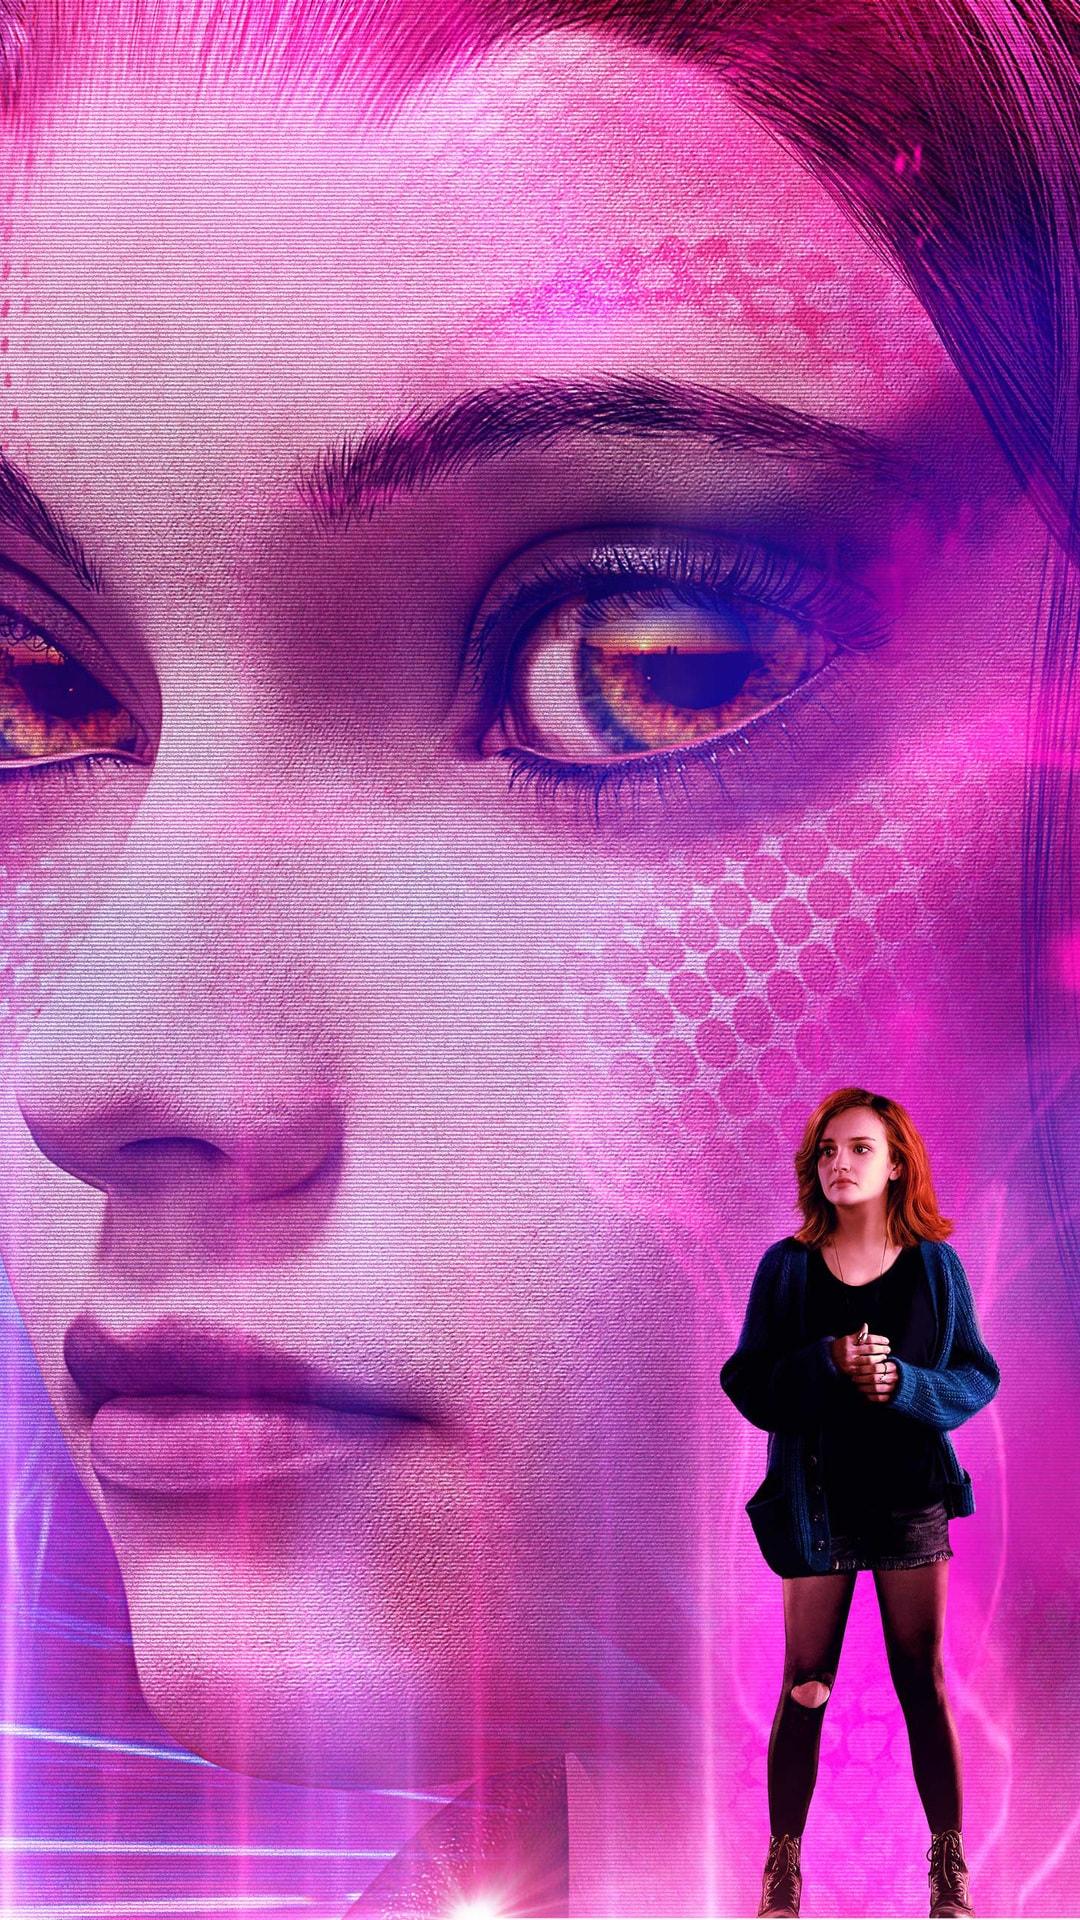 Olivia Cooke as Art3mis